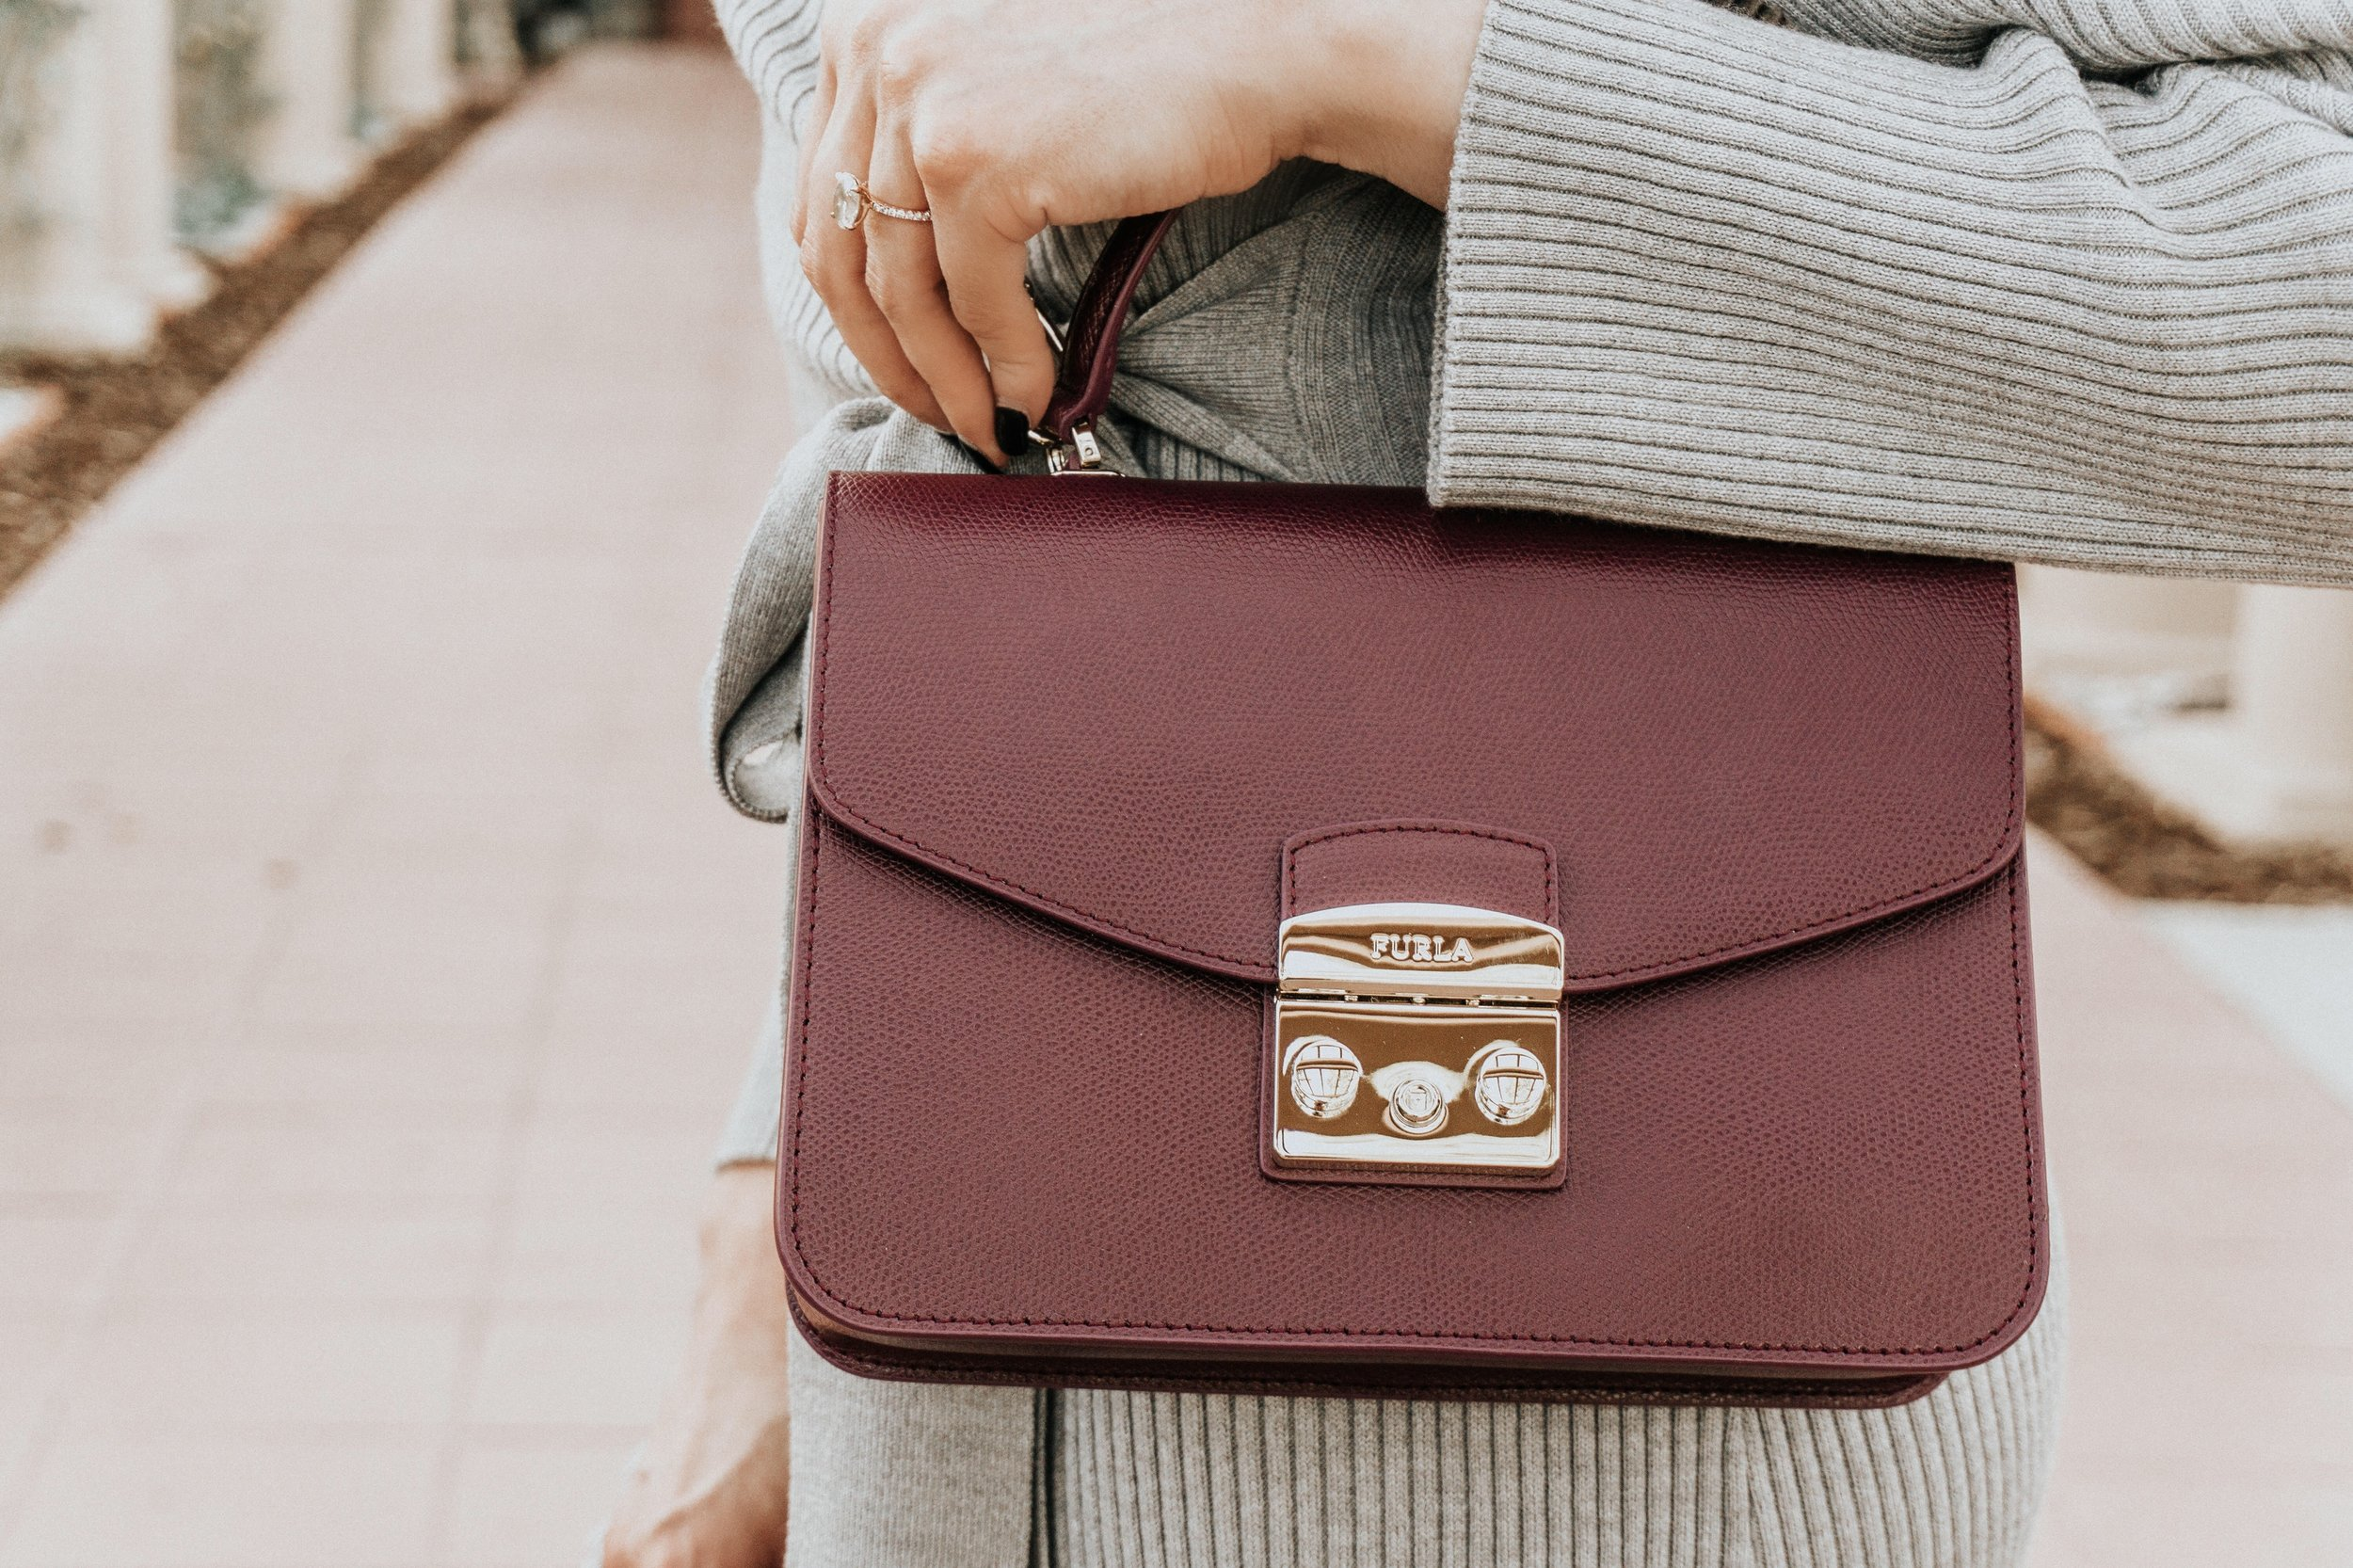 Get The Look - Furla Amaranto Bag | Osman Wrap Dress | Unisa Black Boot